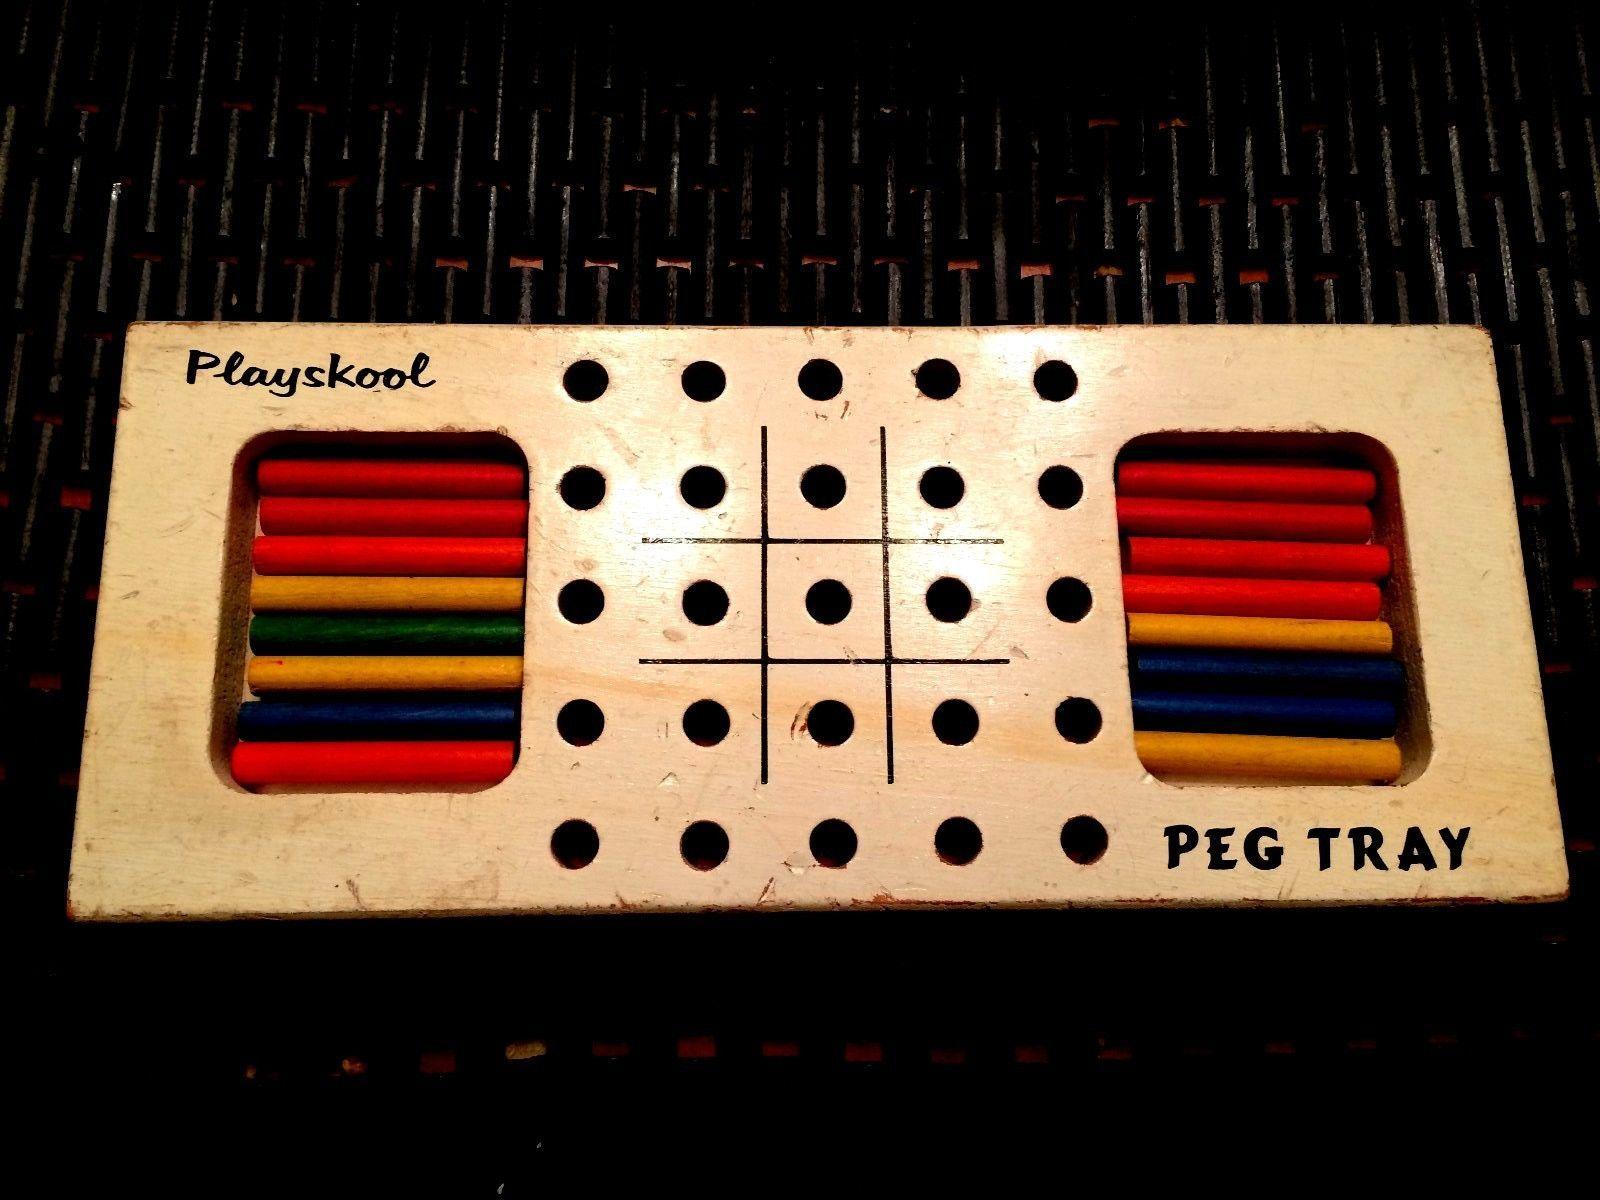 "Playskool ""Peg Tray"" game"